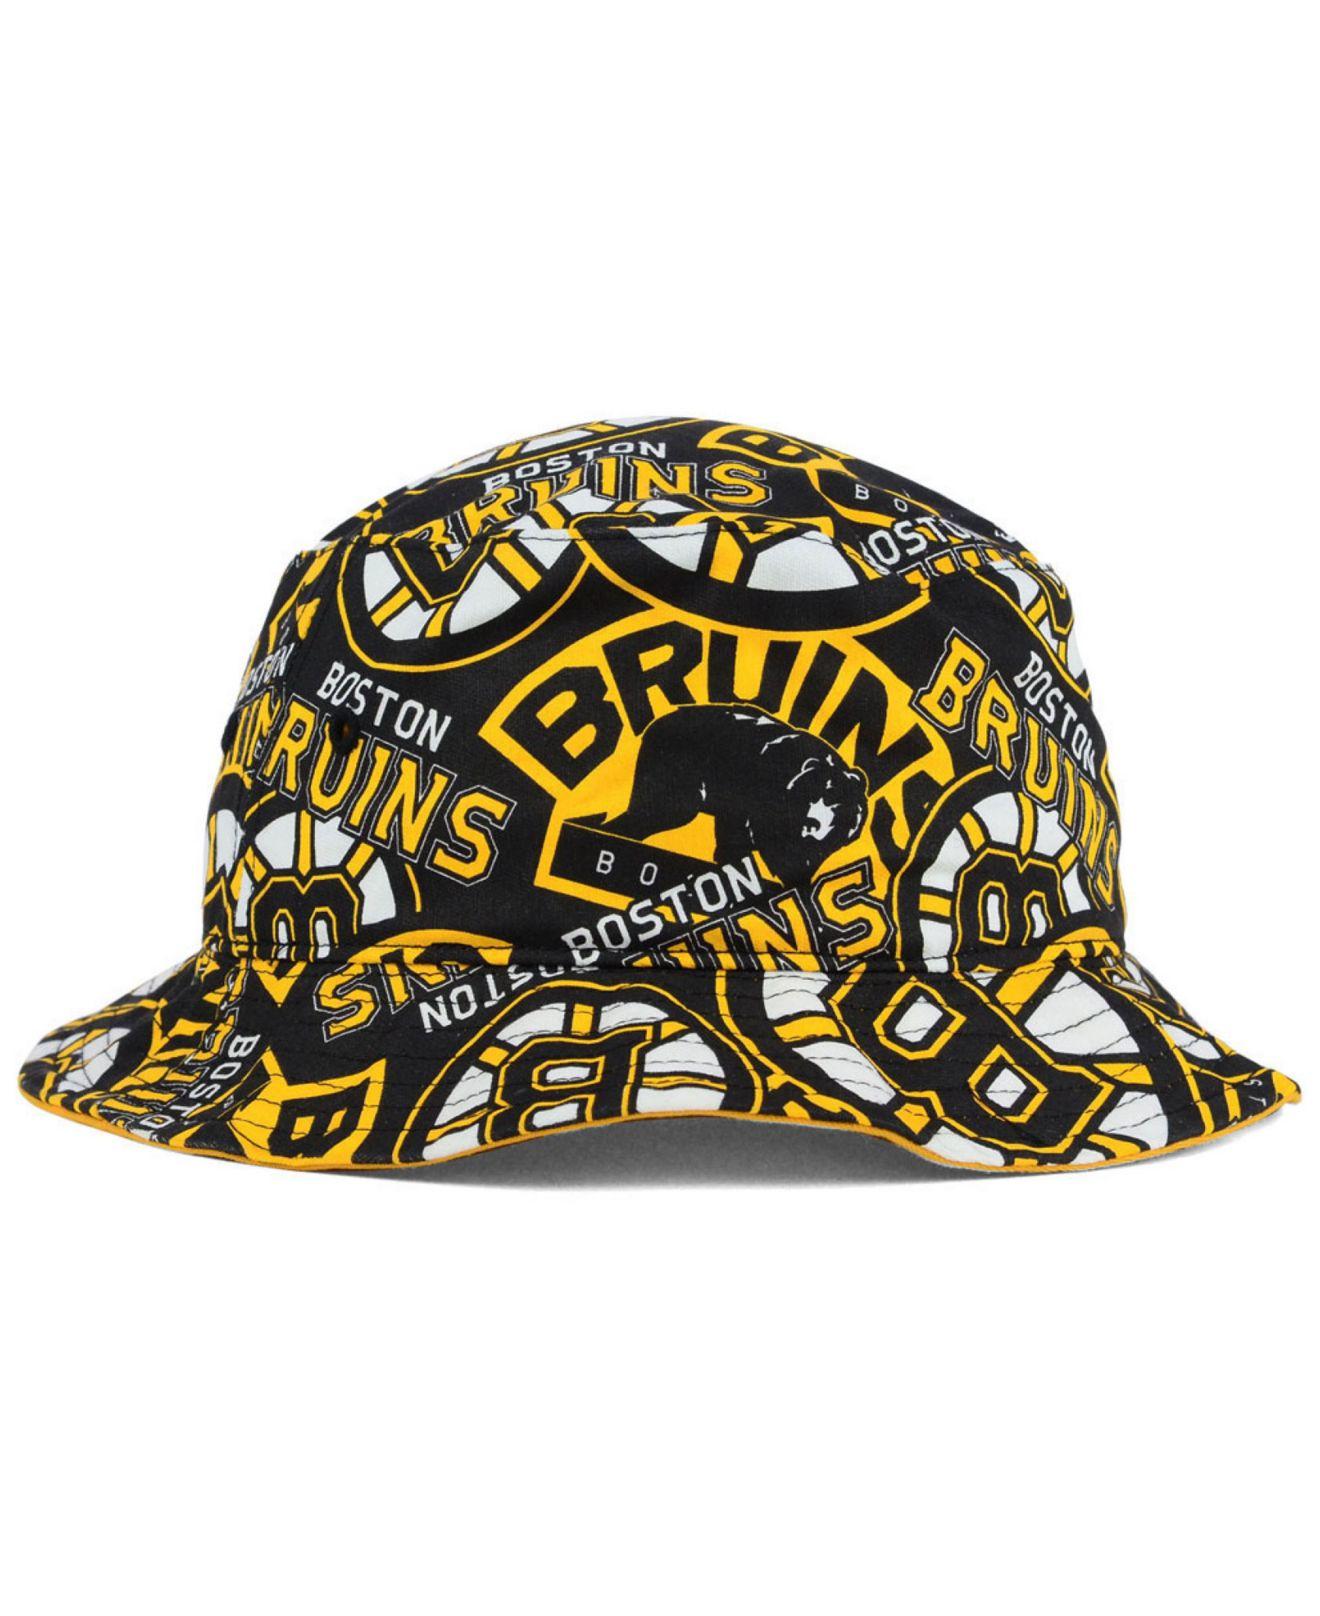 933c9a0a lyst 47 brand boston bruins bravado bucket hat in black for men